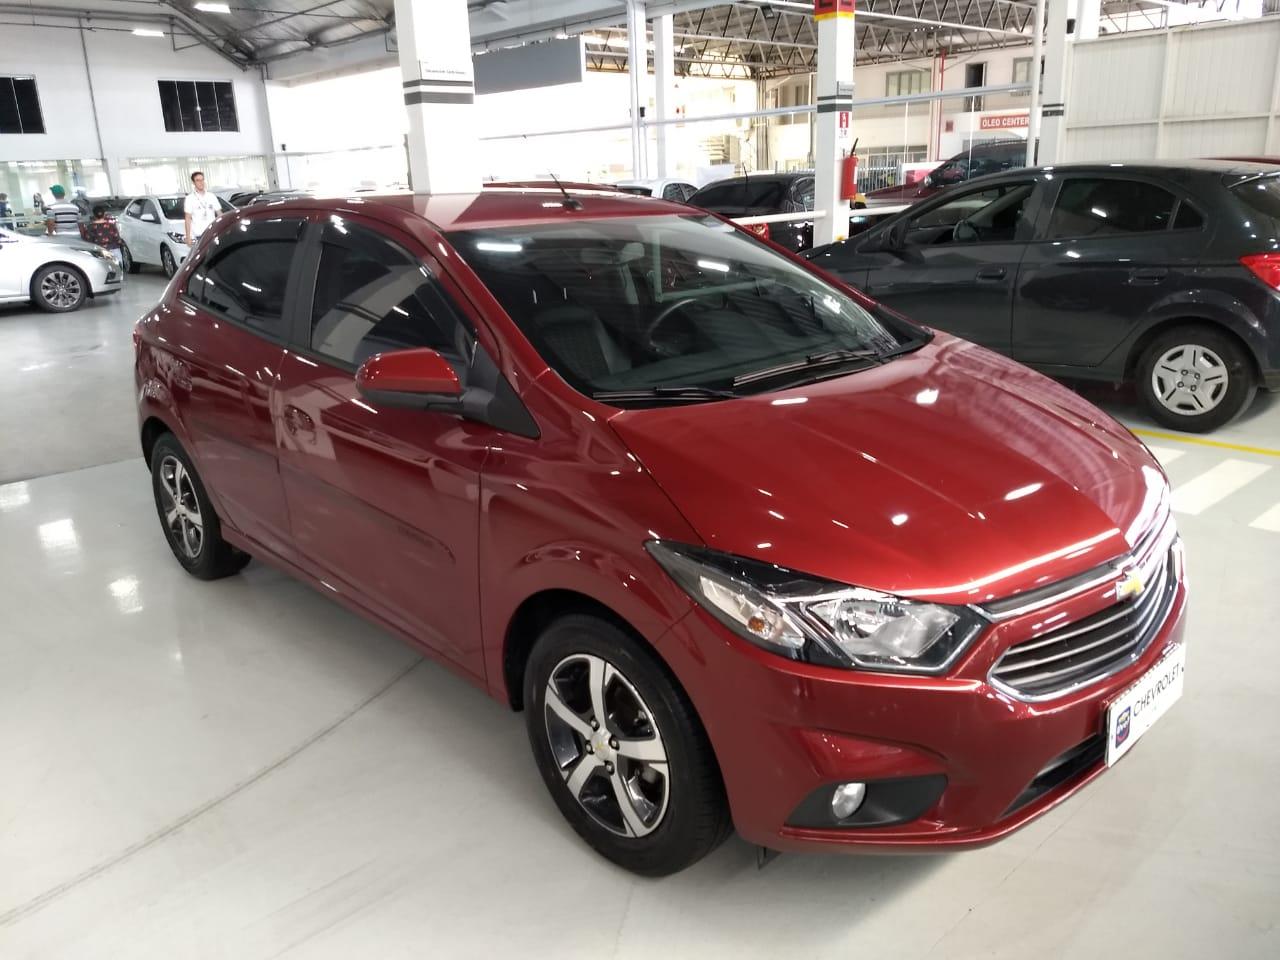 Chevrolet Onix LTZ 1.4L 2017